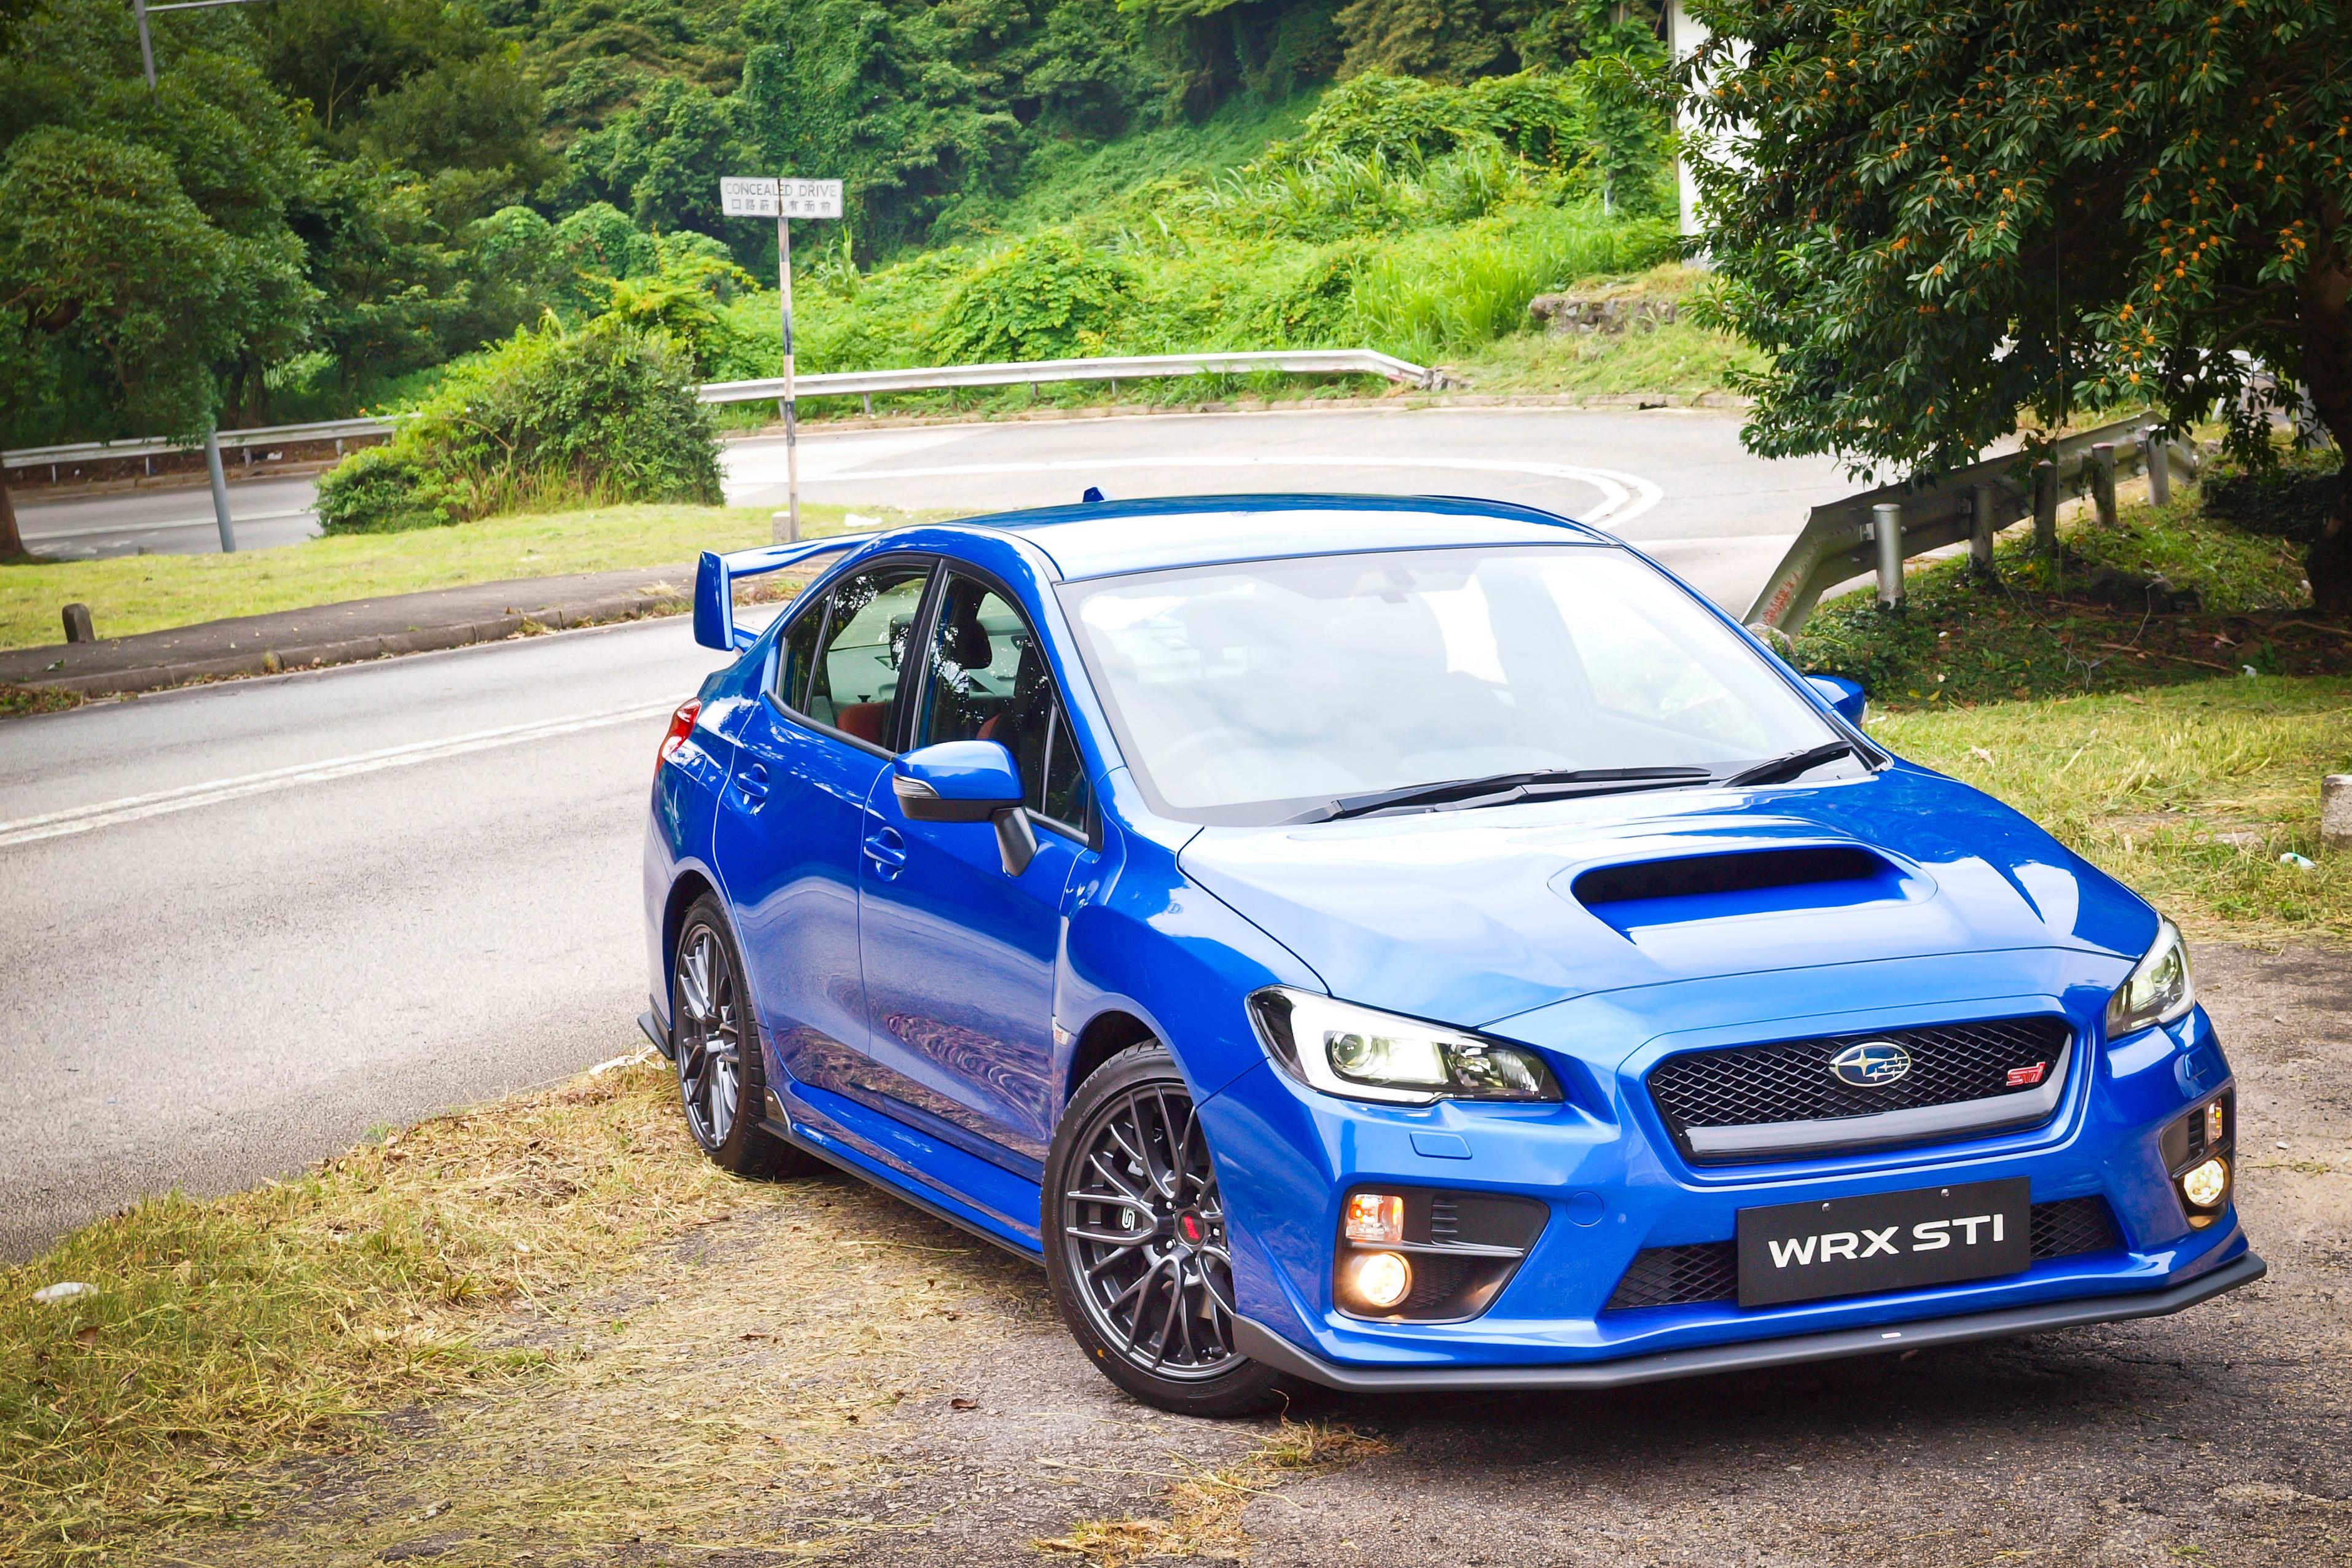 Subaru recalls 1,303,530 vehicles for brake light switch issue